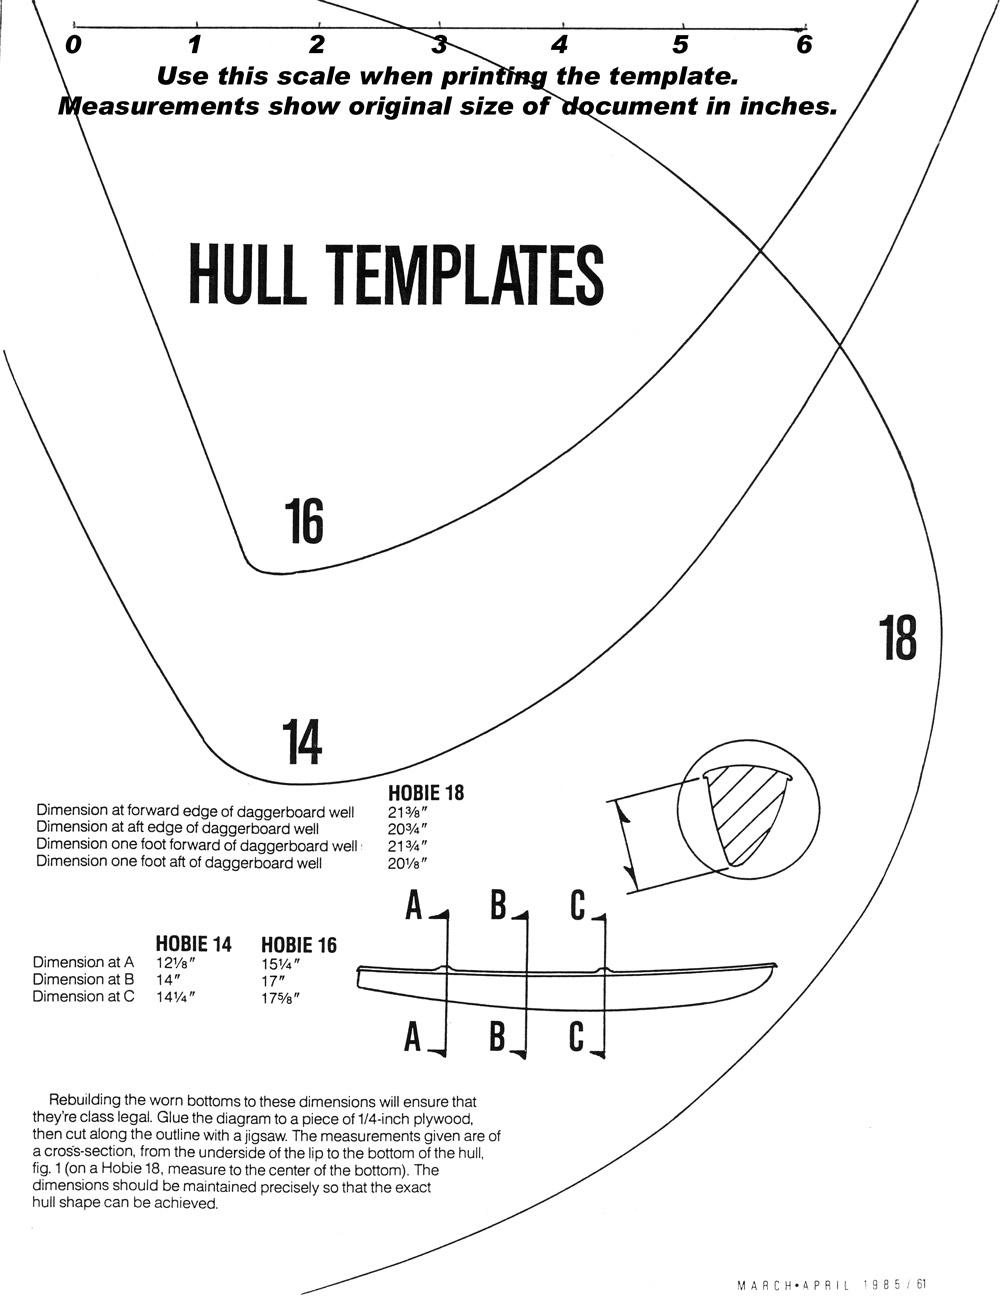 medium resolution of keel shape templates hobie 14 16 and 18